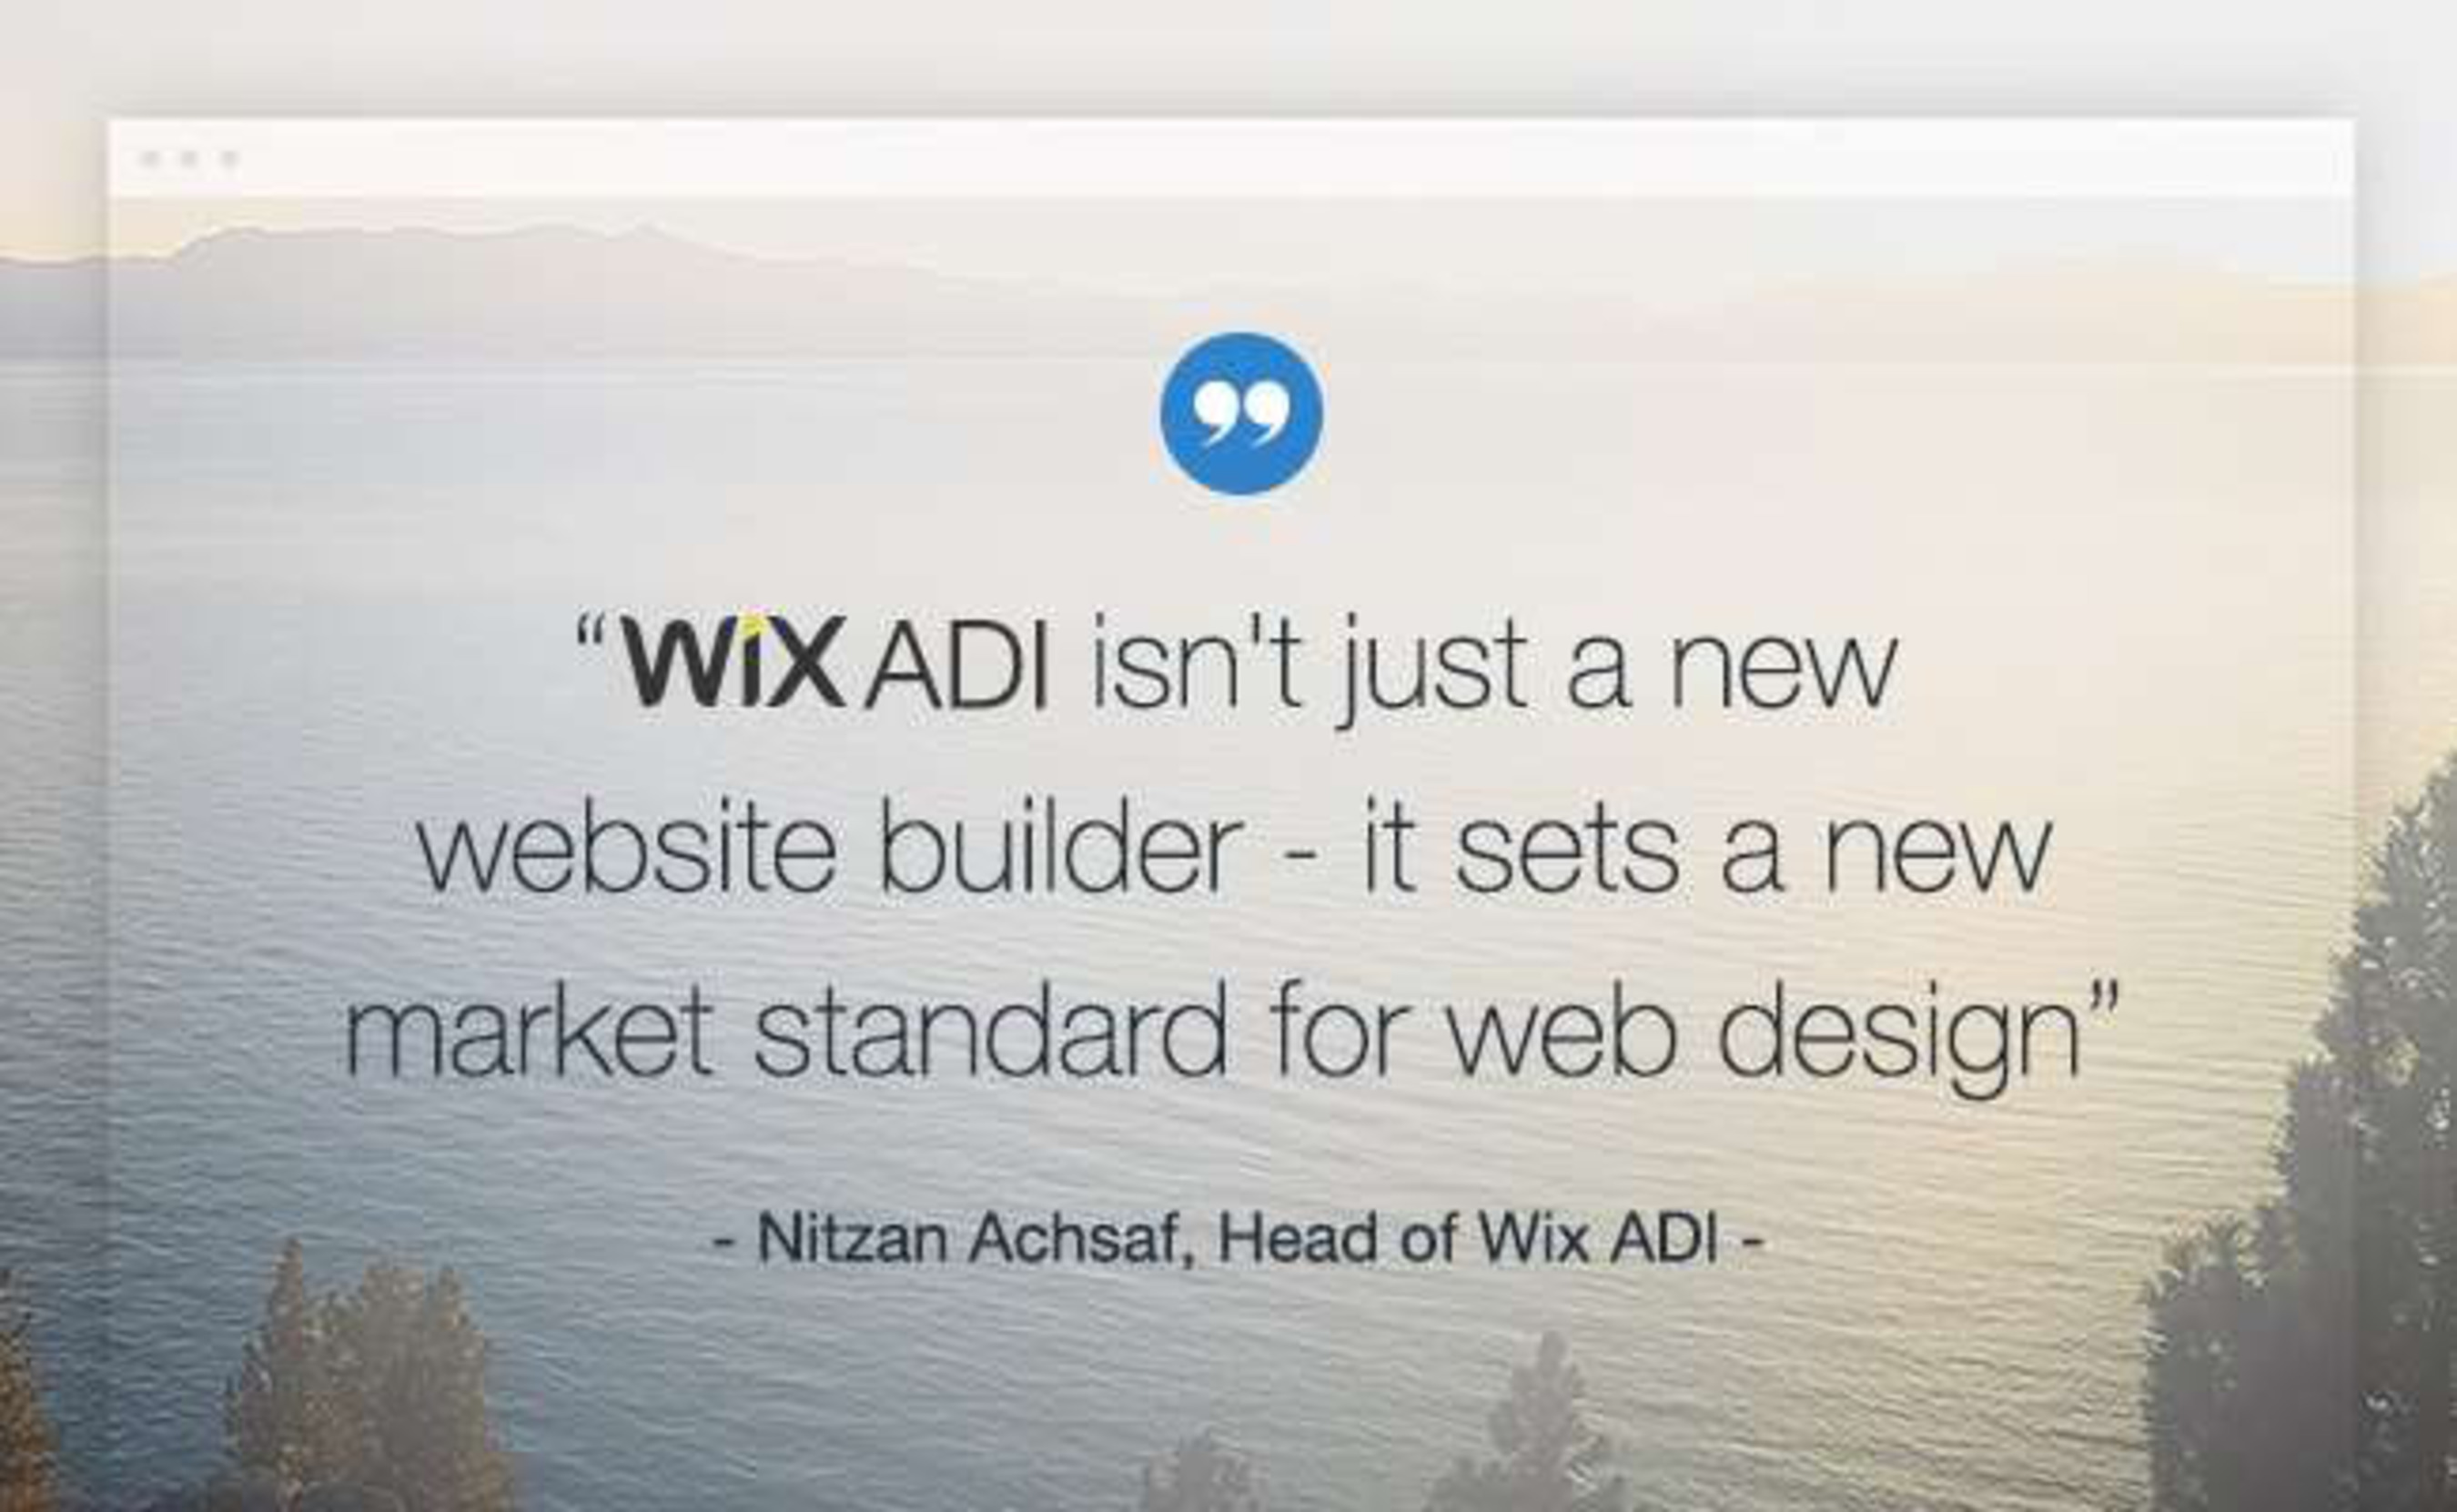 Wix announced Wix ADI